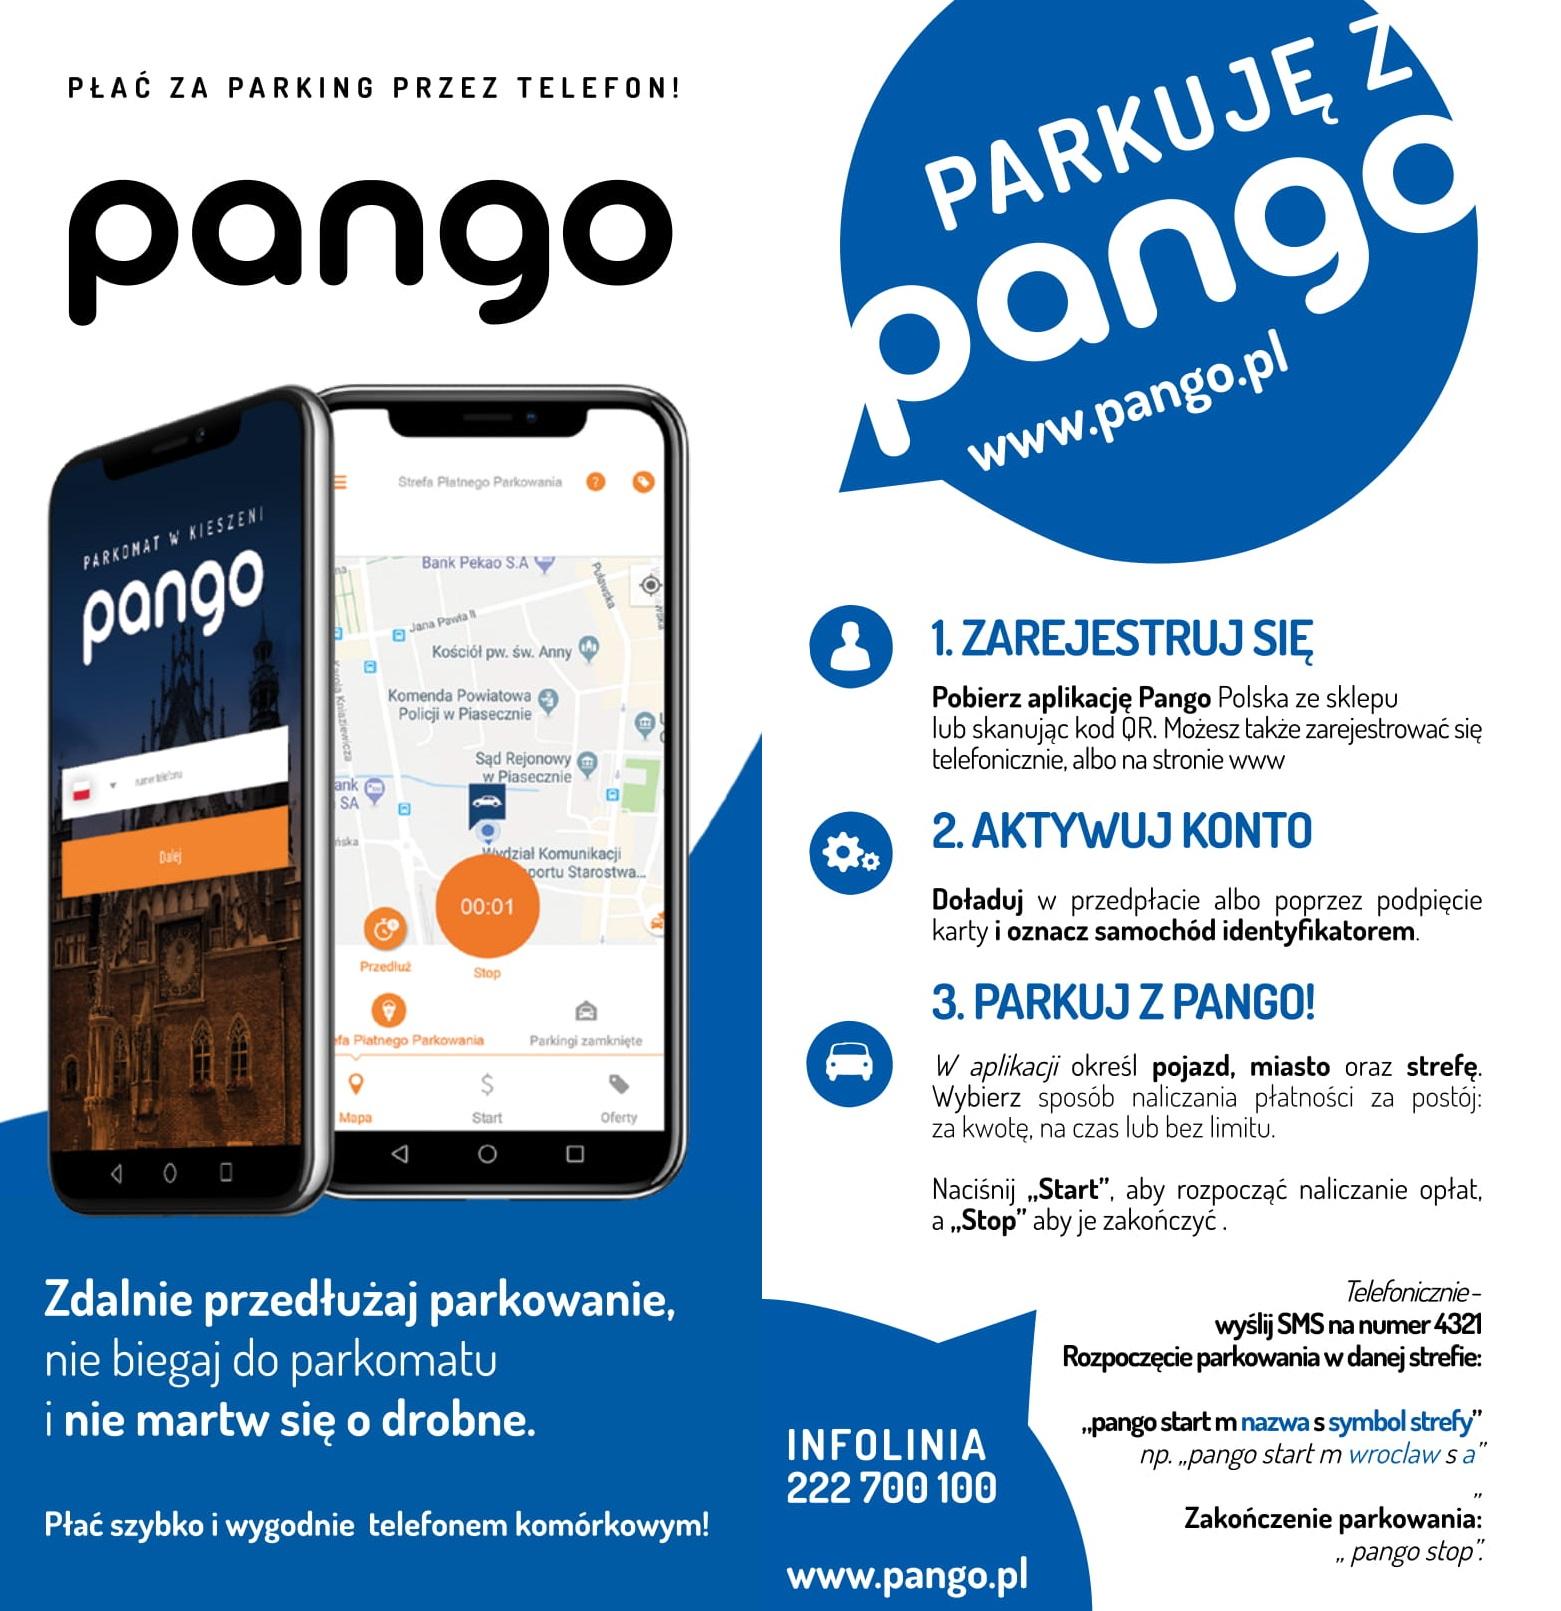 http://m.82-200.pl/2020/09/orig/pango-v3-ulotka-web-1-6450.jpg